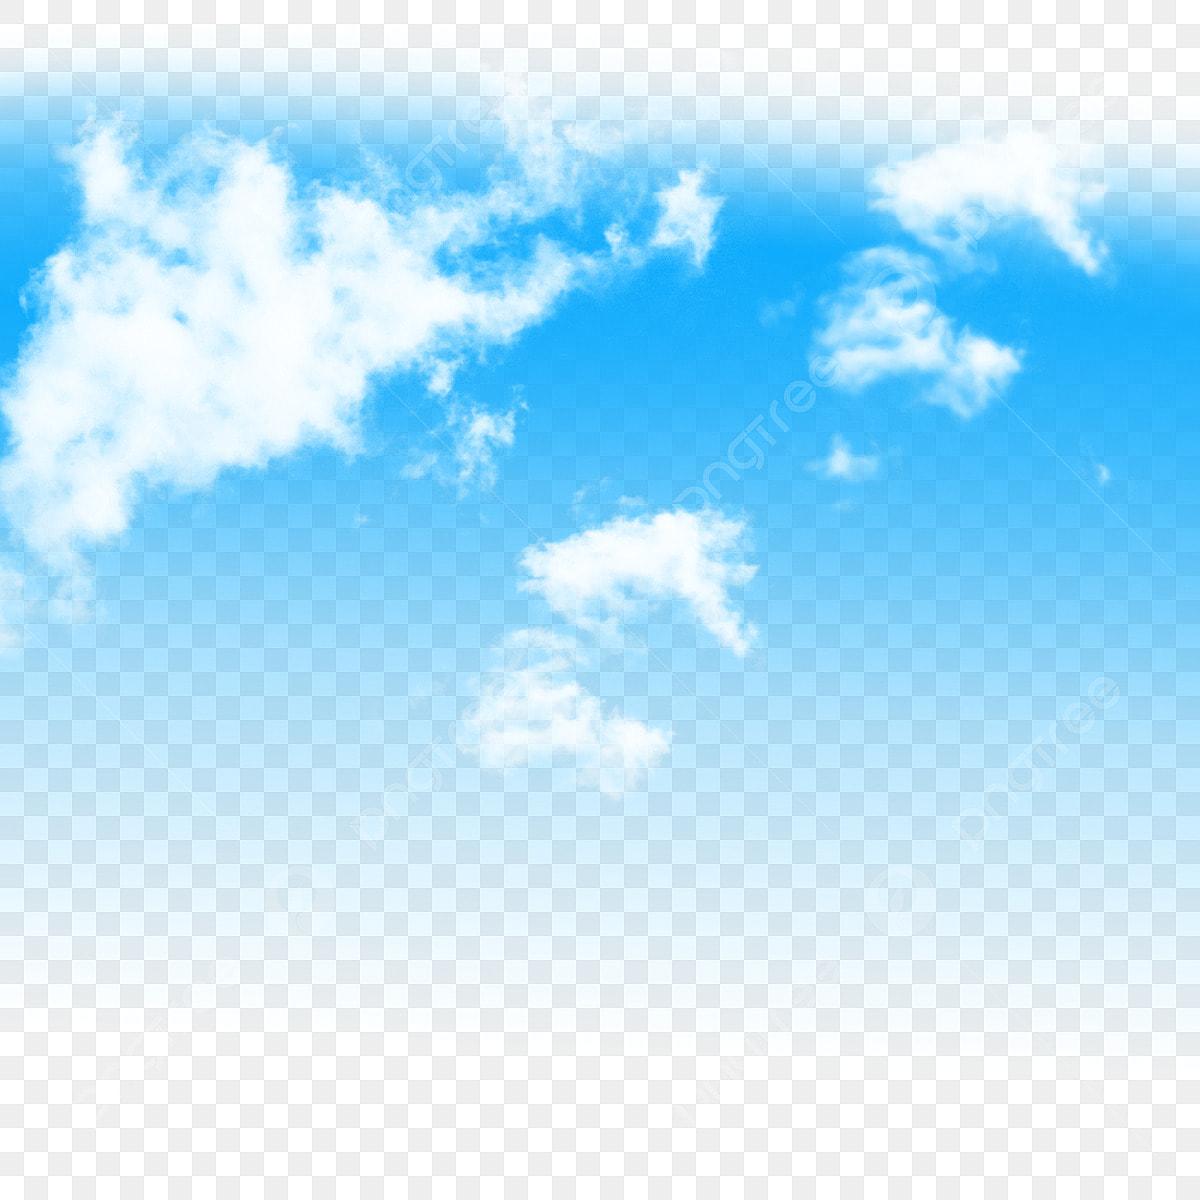 gambar biru awan biru awan putih awan putih awan putih langit biru biru png dan psd untuk muat turun percuma https ms pngtree com freepng blue sky blue white clouds white clouds 3940604 html